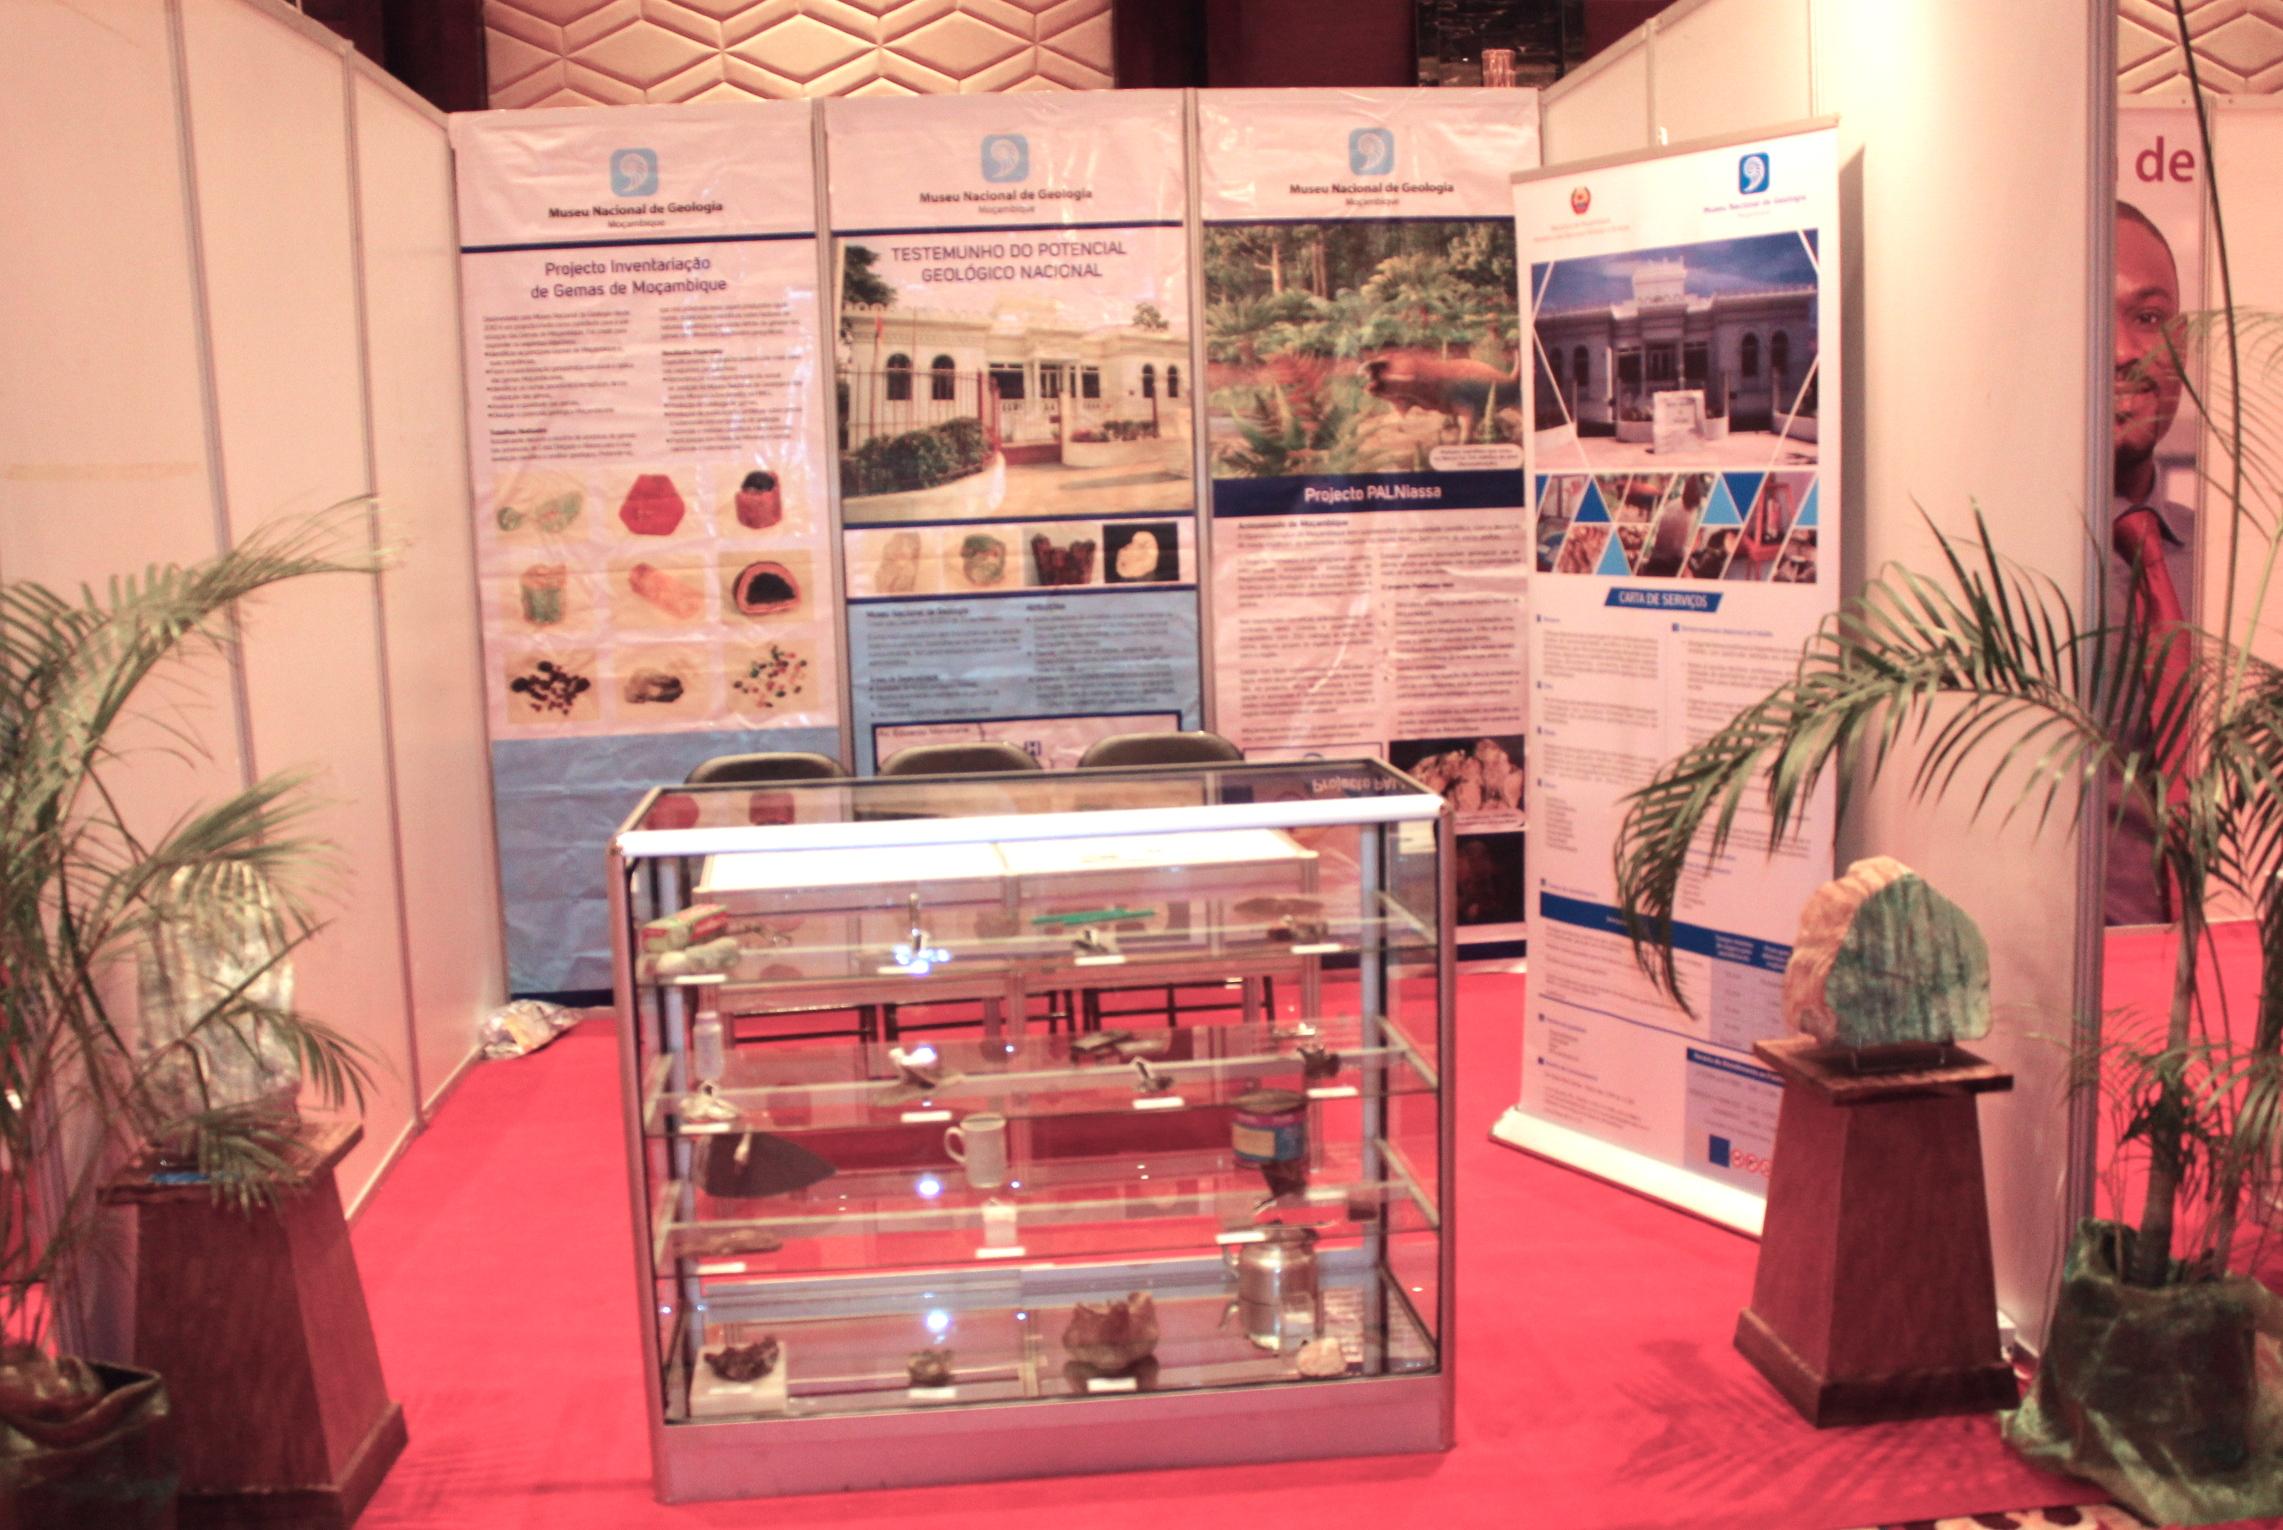 PalNiassa/Museu Nacional de Geologia stand at the EDUCA Mozambique: International Education Fair and Conference.